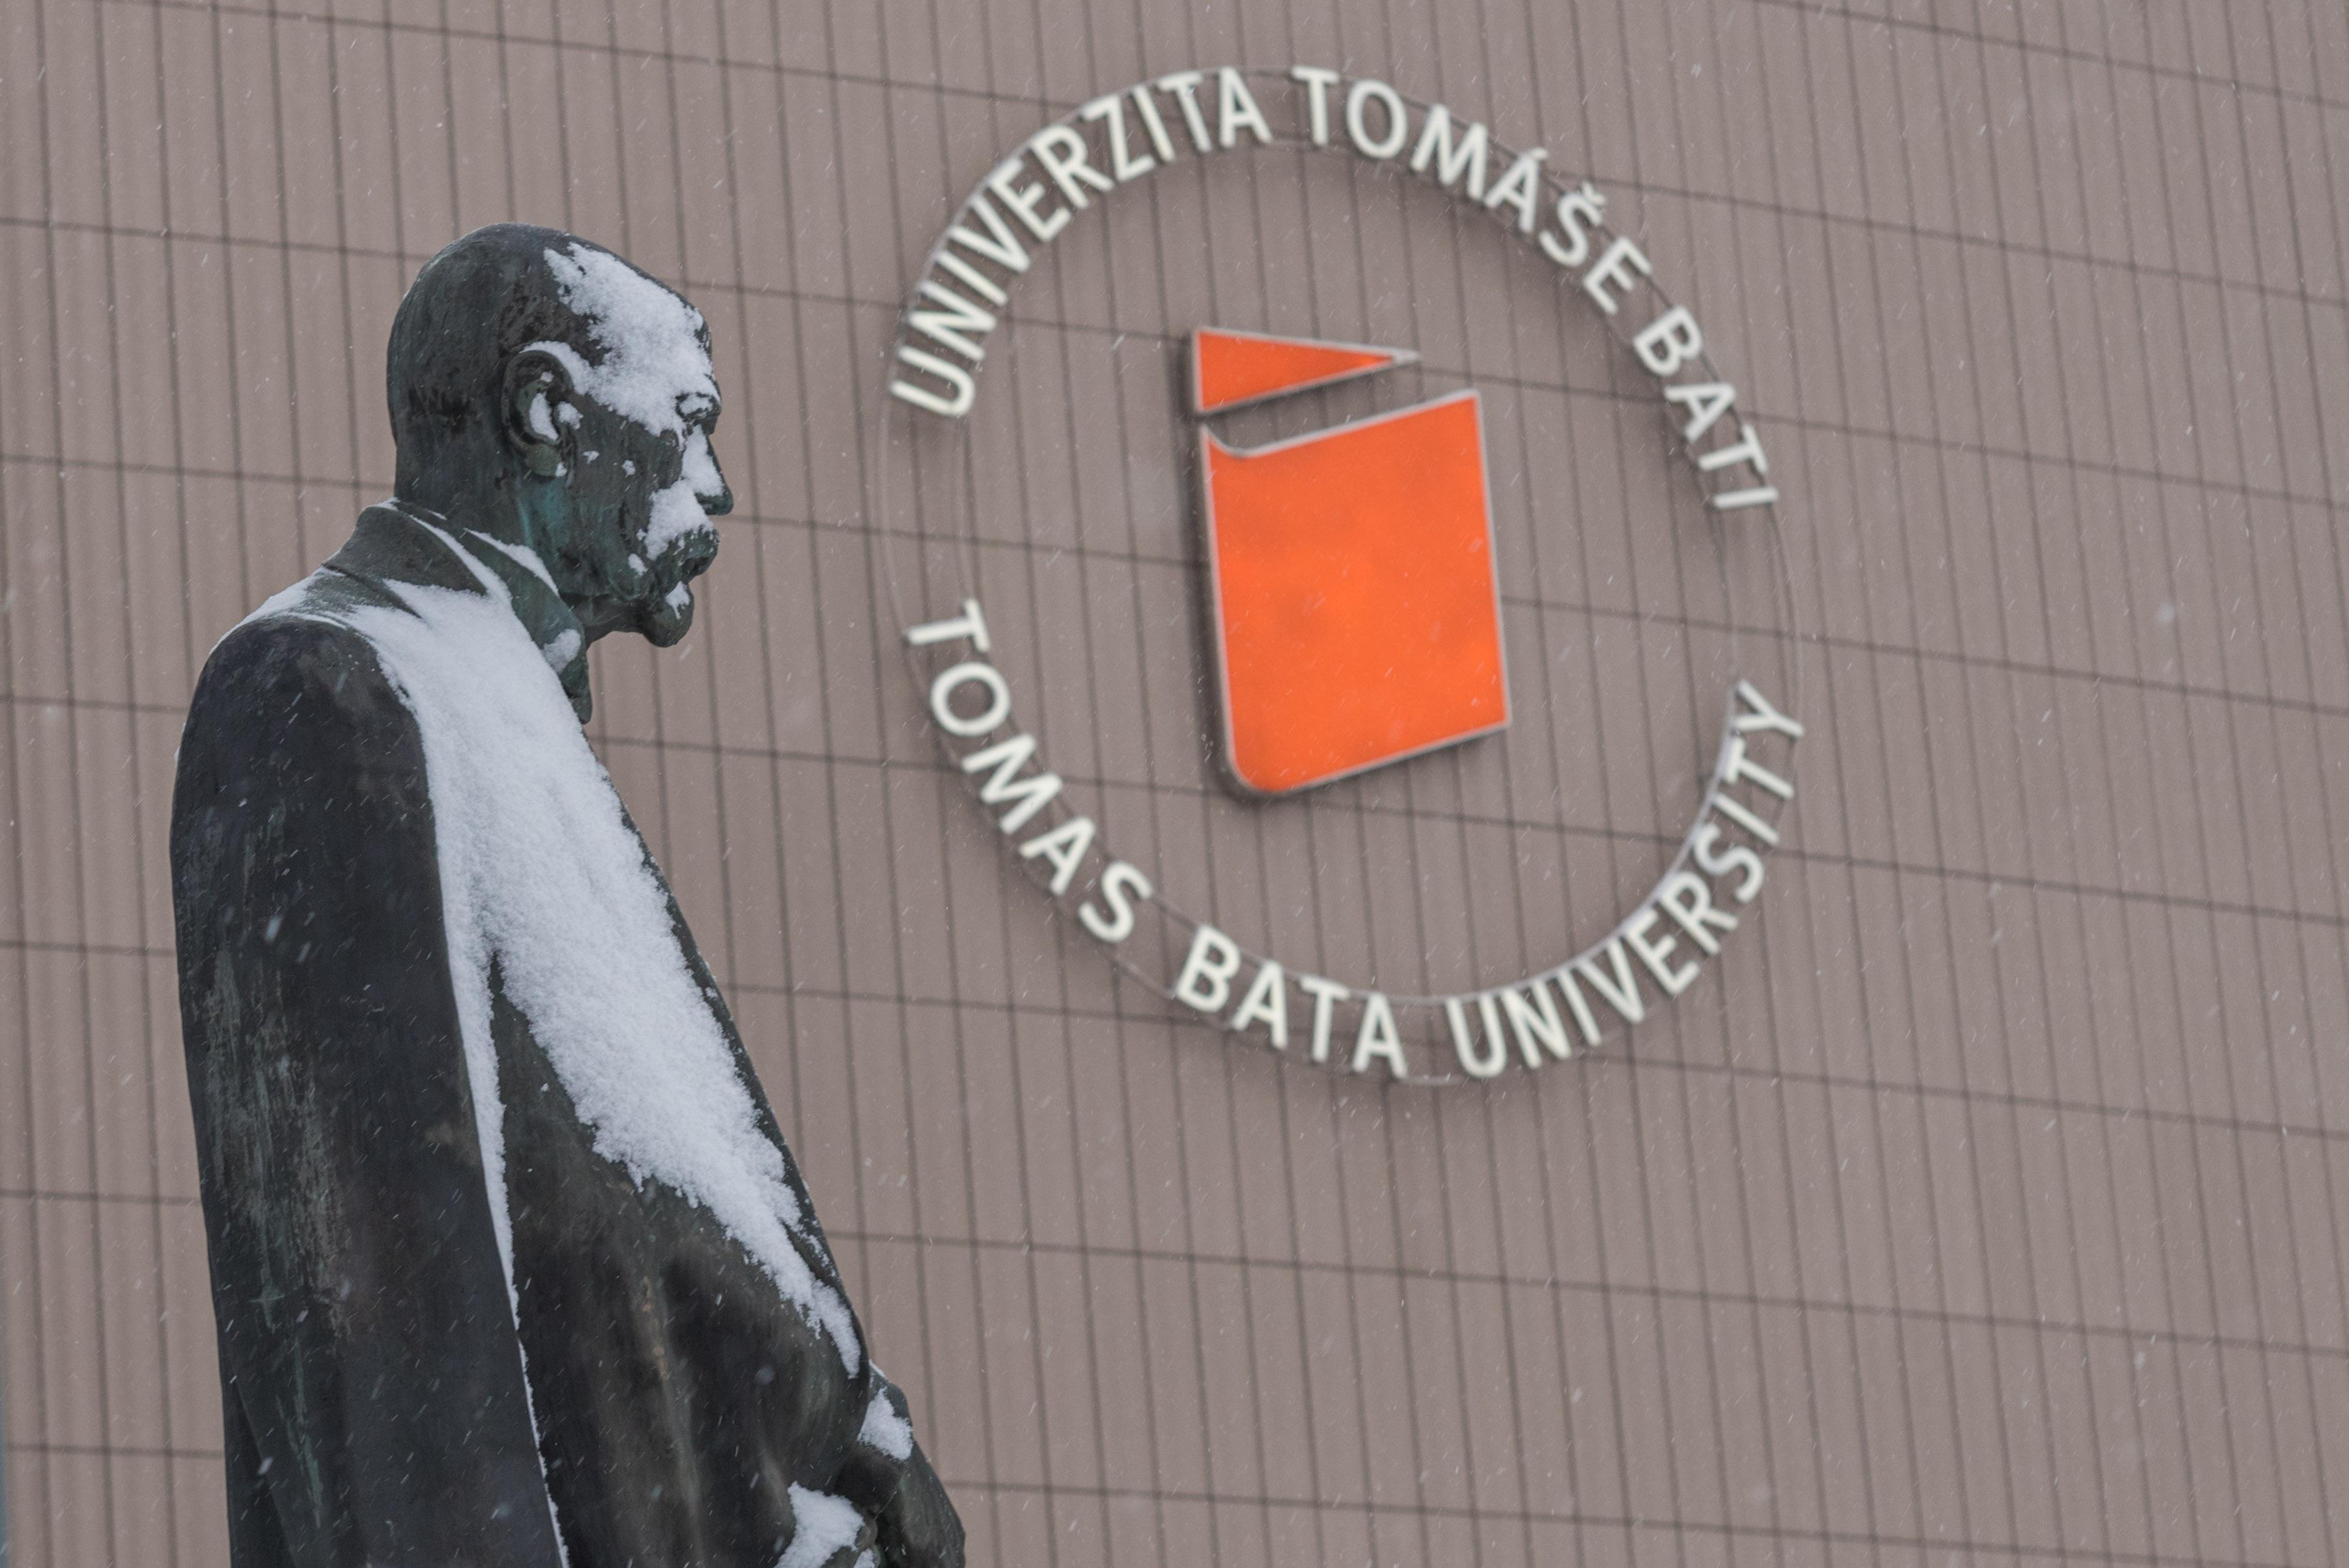 Thomas Bata university2